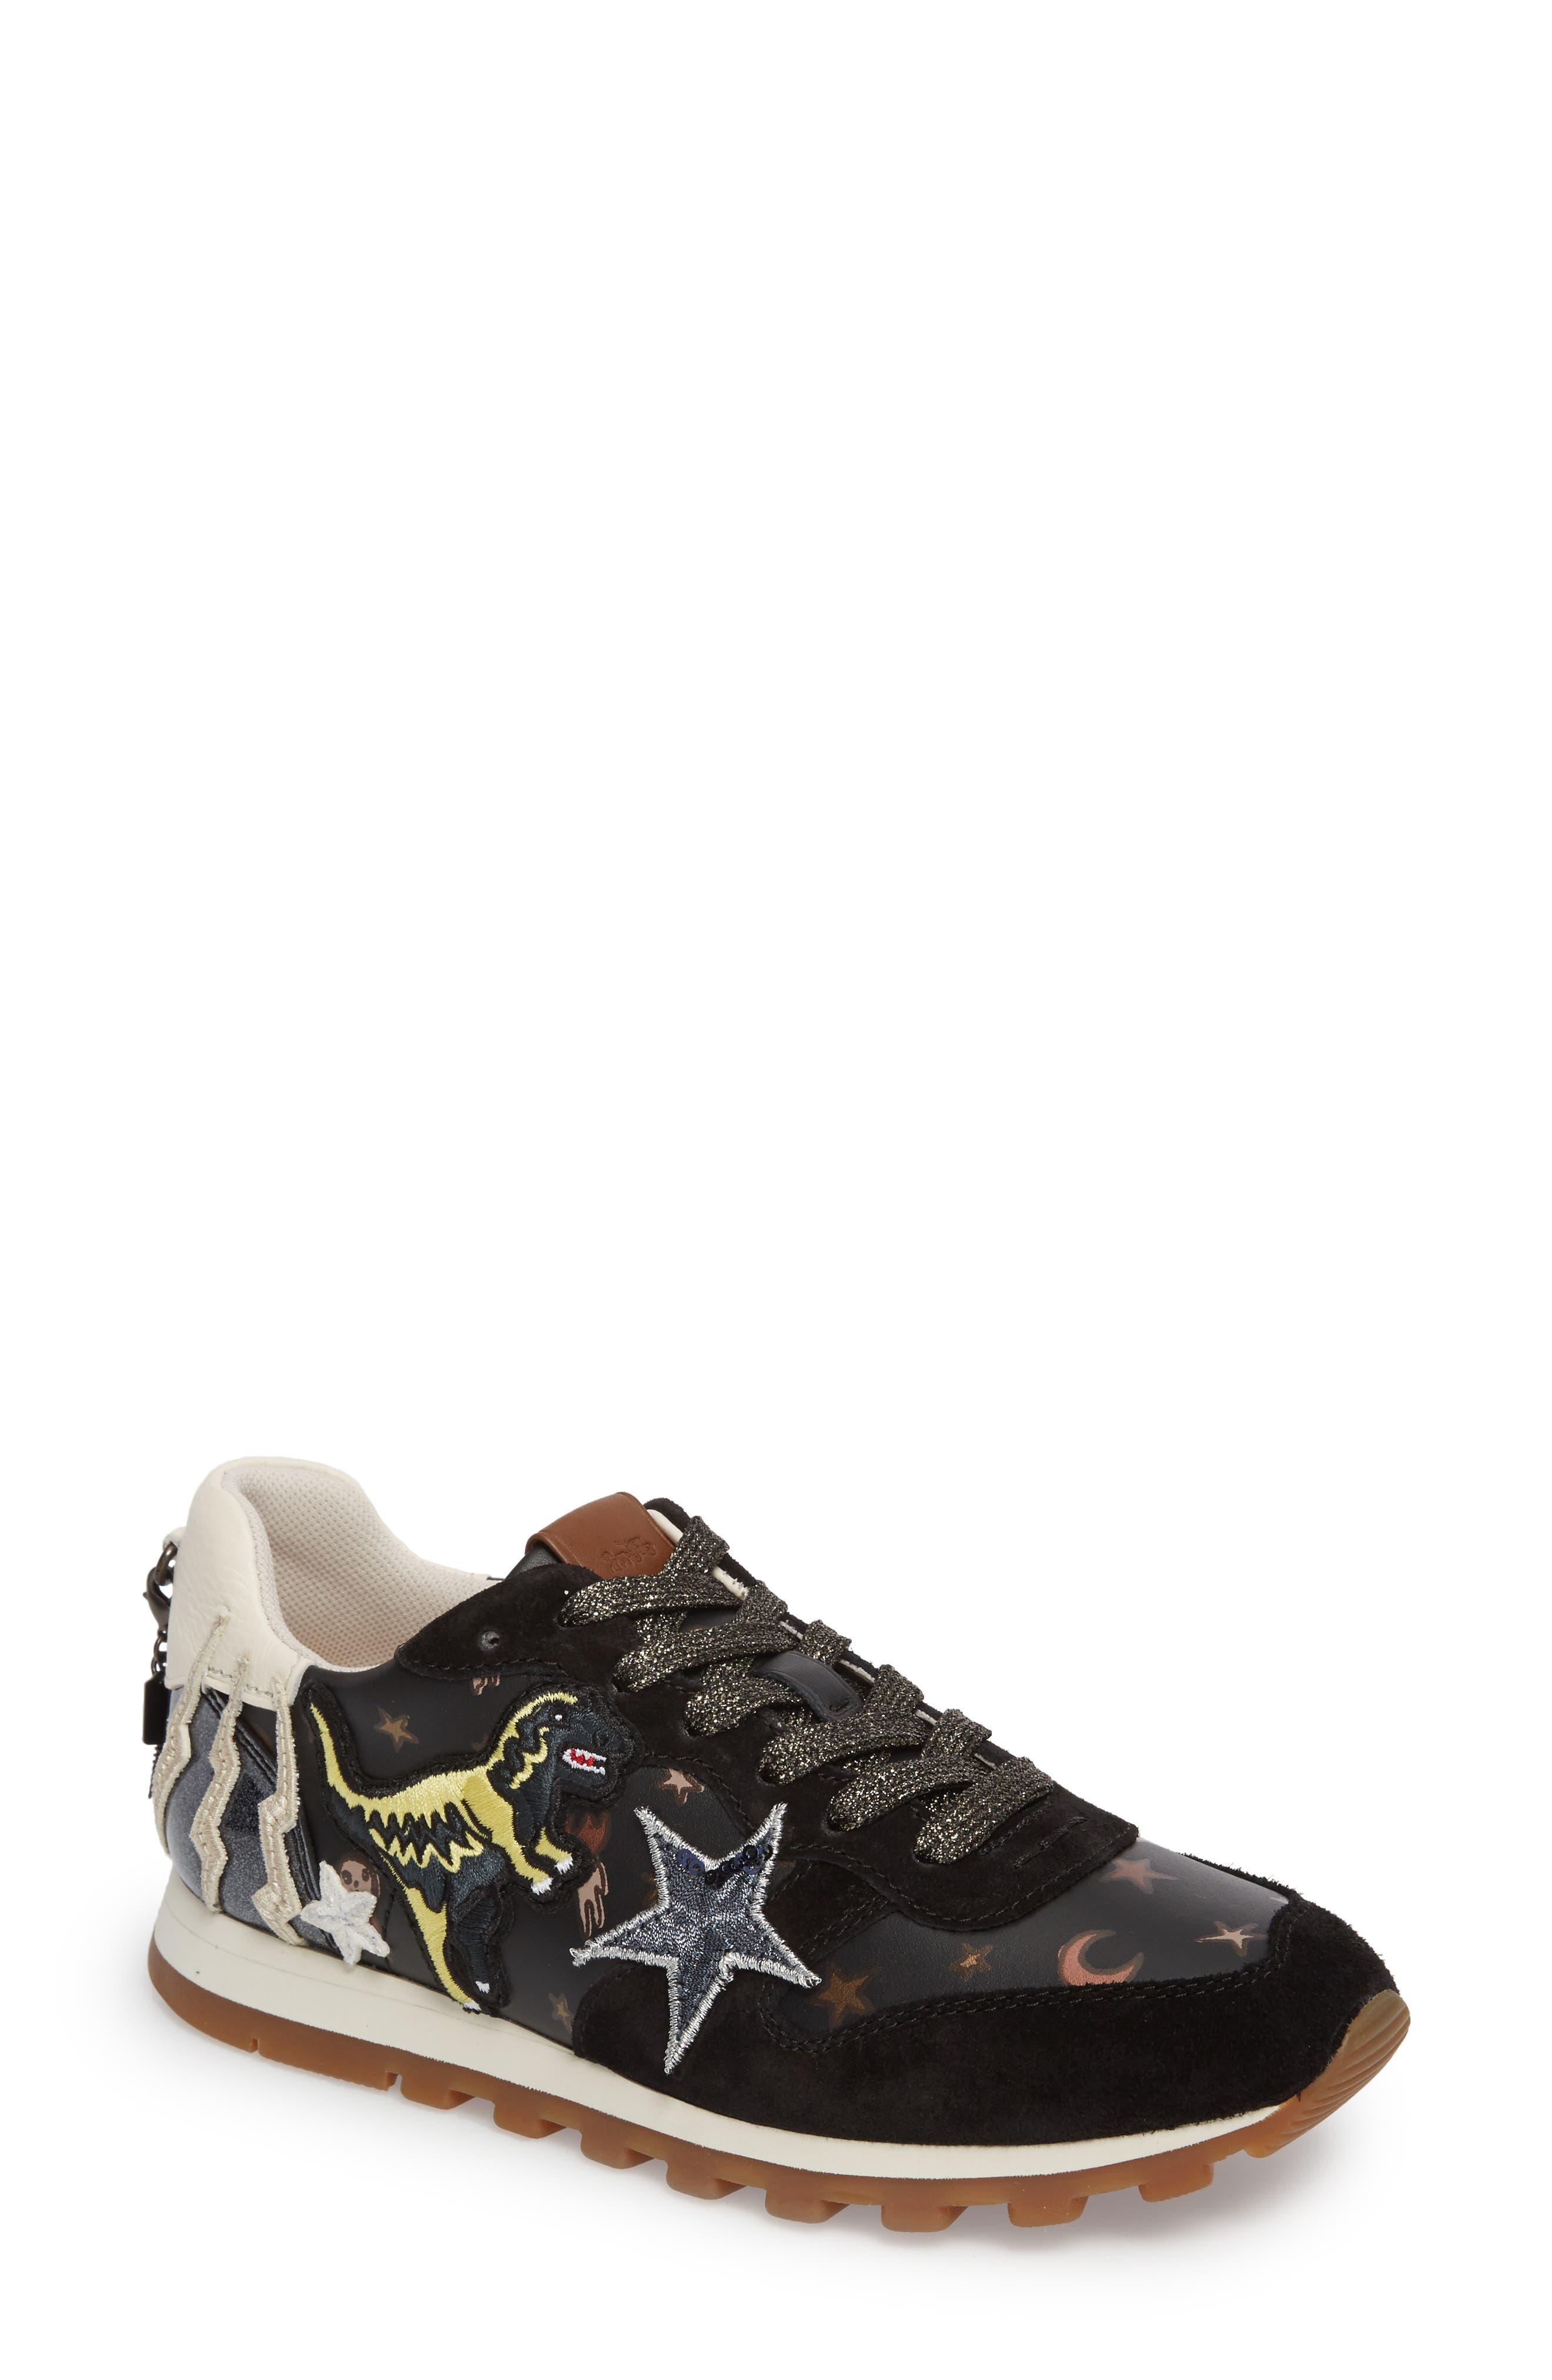 Alternate Image 1 Selected - COACH Rex Patch Sneaker (Women)